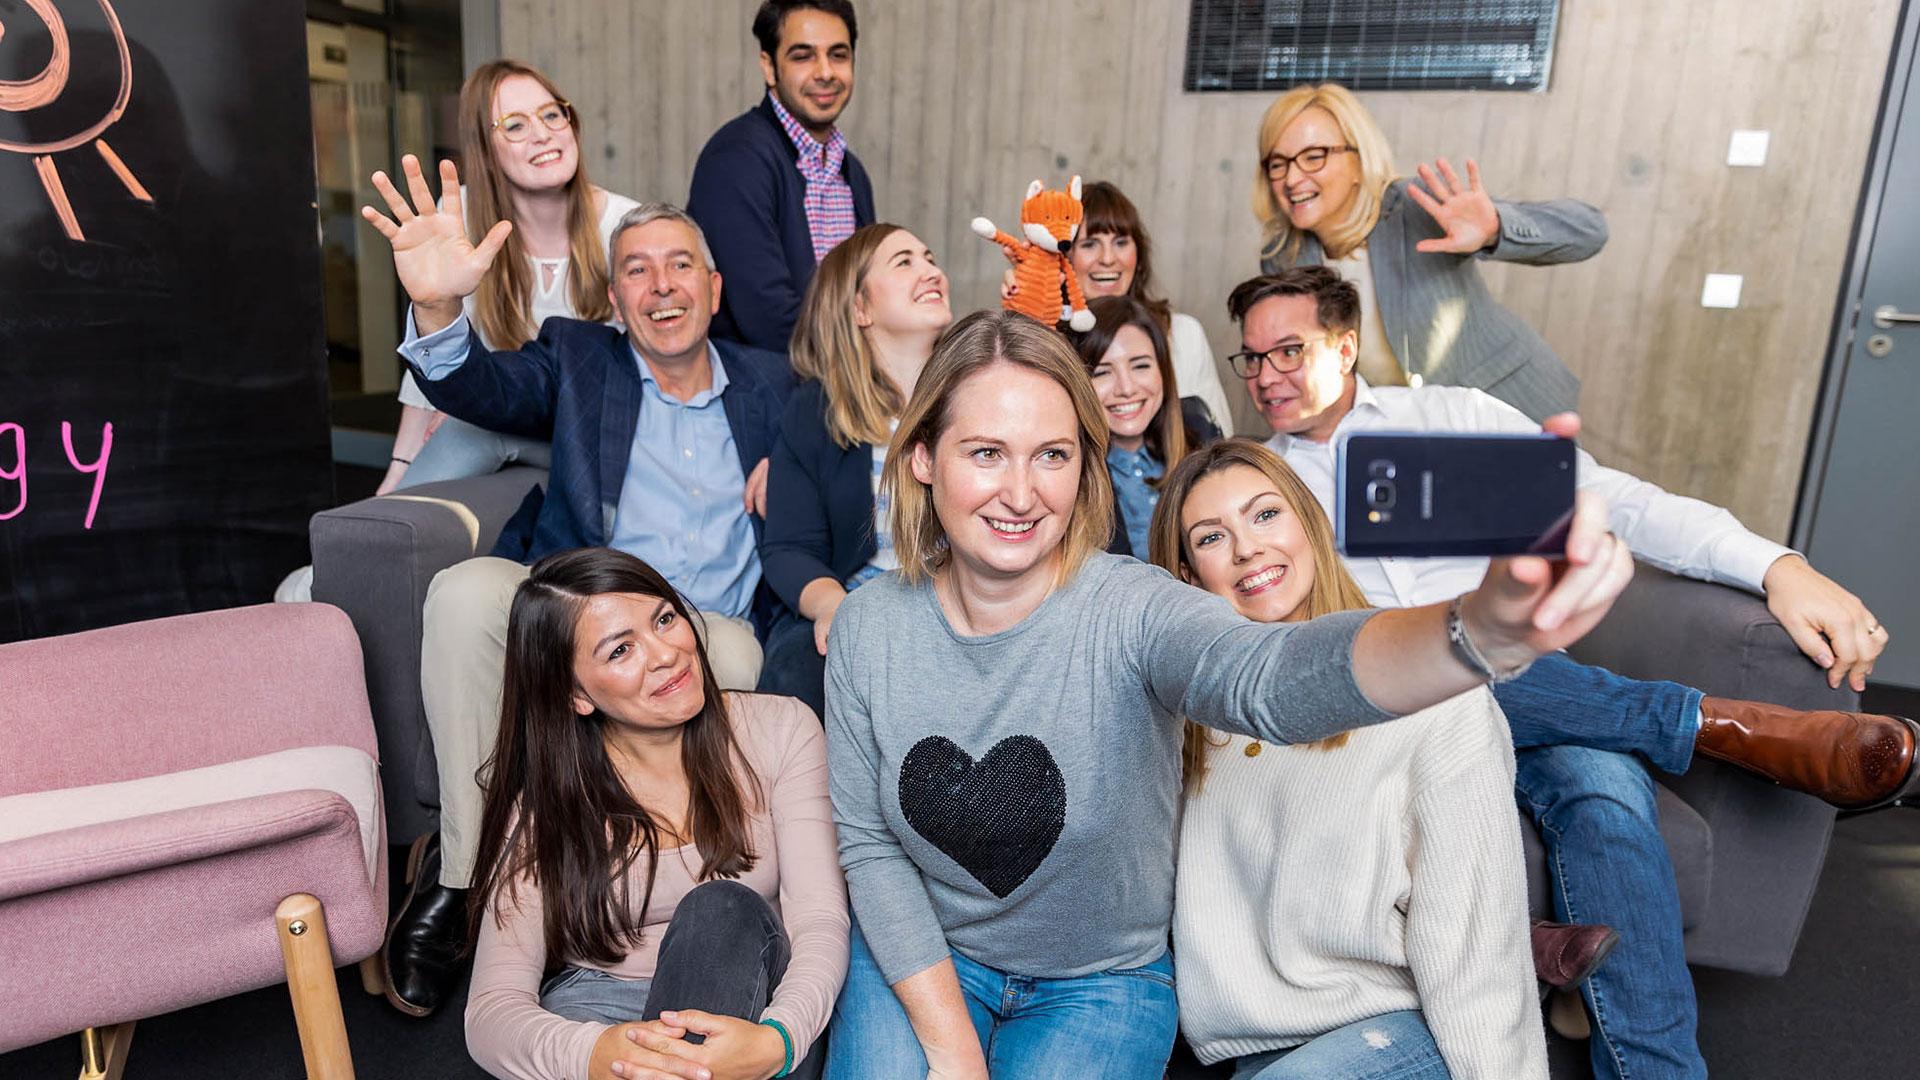 imc employees gather to take a selfie